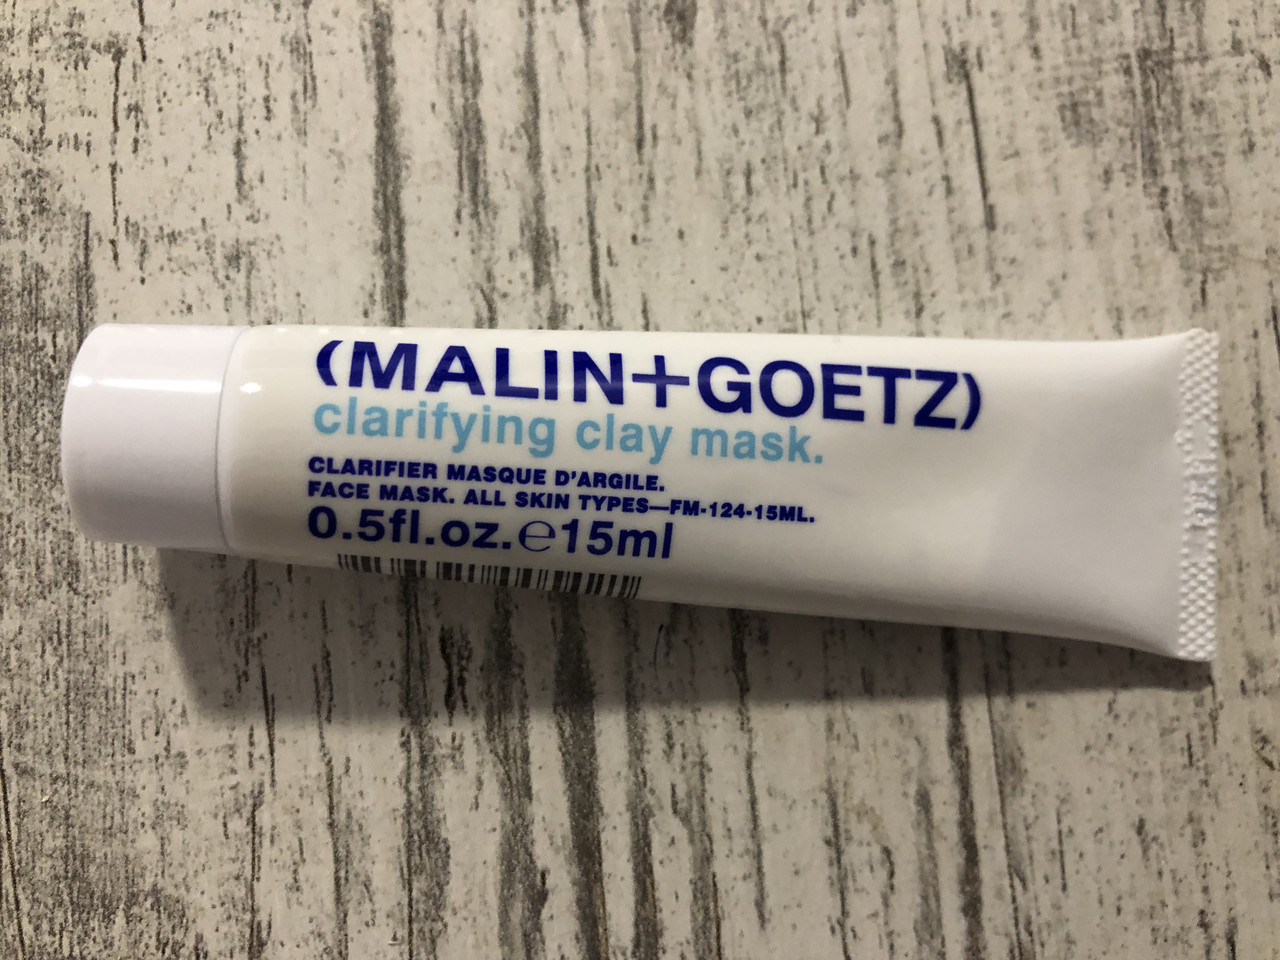 Глубокоочищающая глиняная маска MALIN GOETZ clarifying clay mask